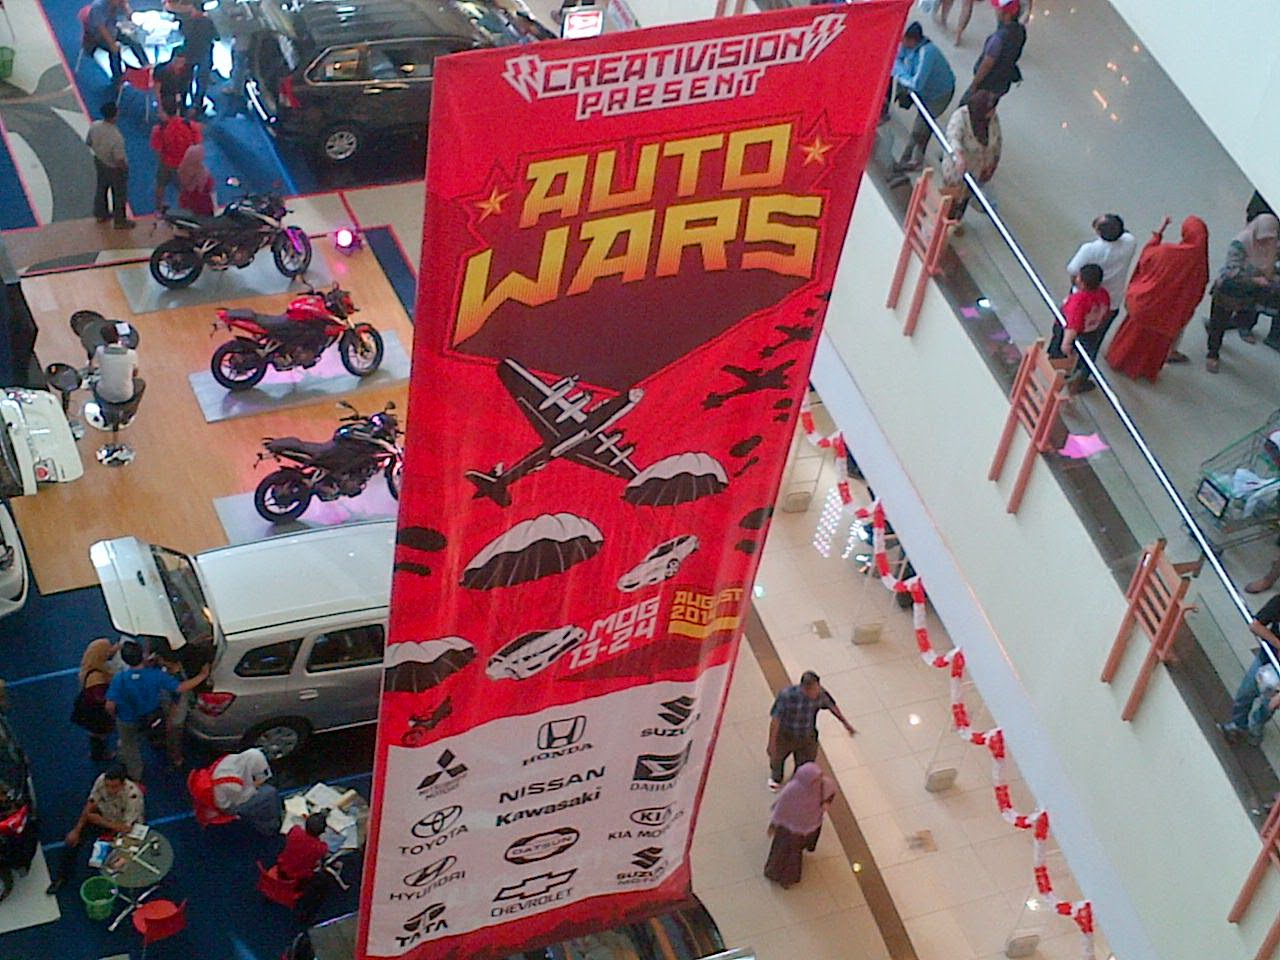 Pameran Otomotive : Auto Wars di Mall Olympic Garden Malang